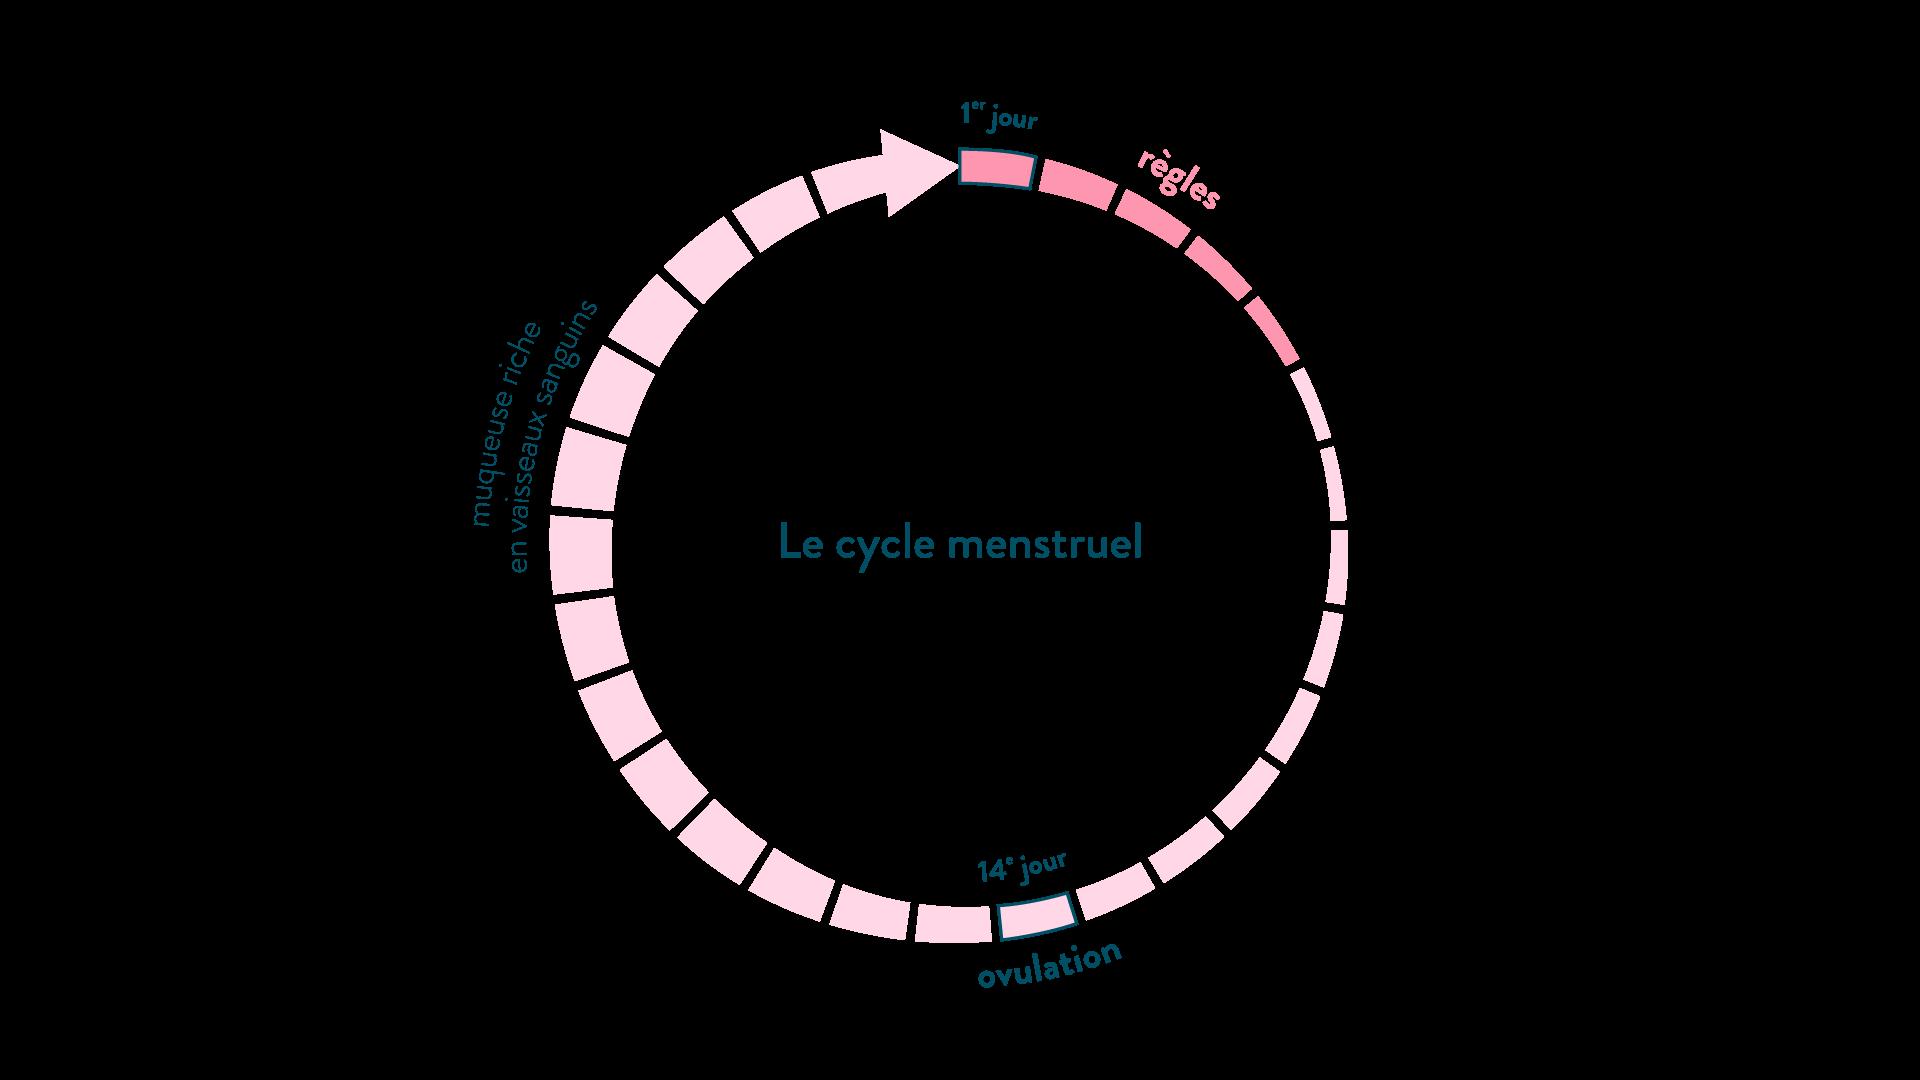 Le cycle menstruel féminin